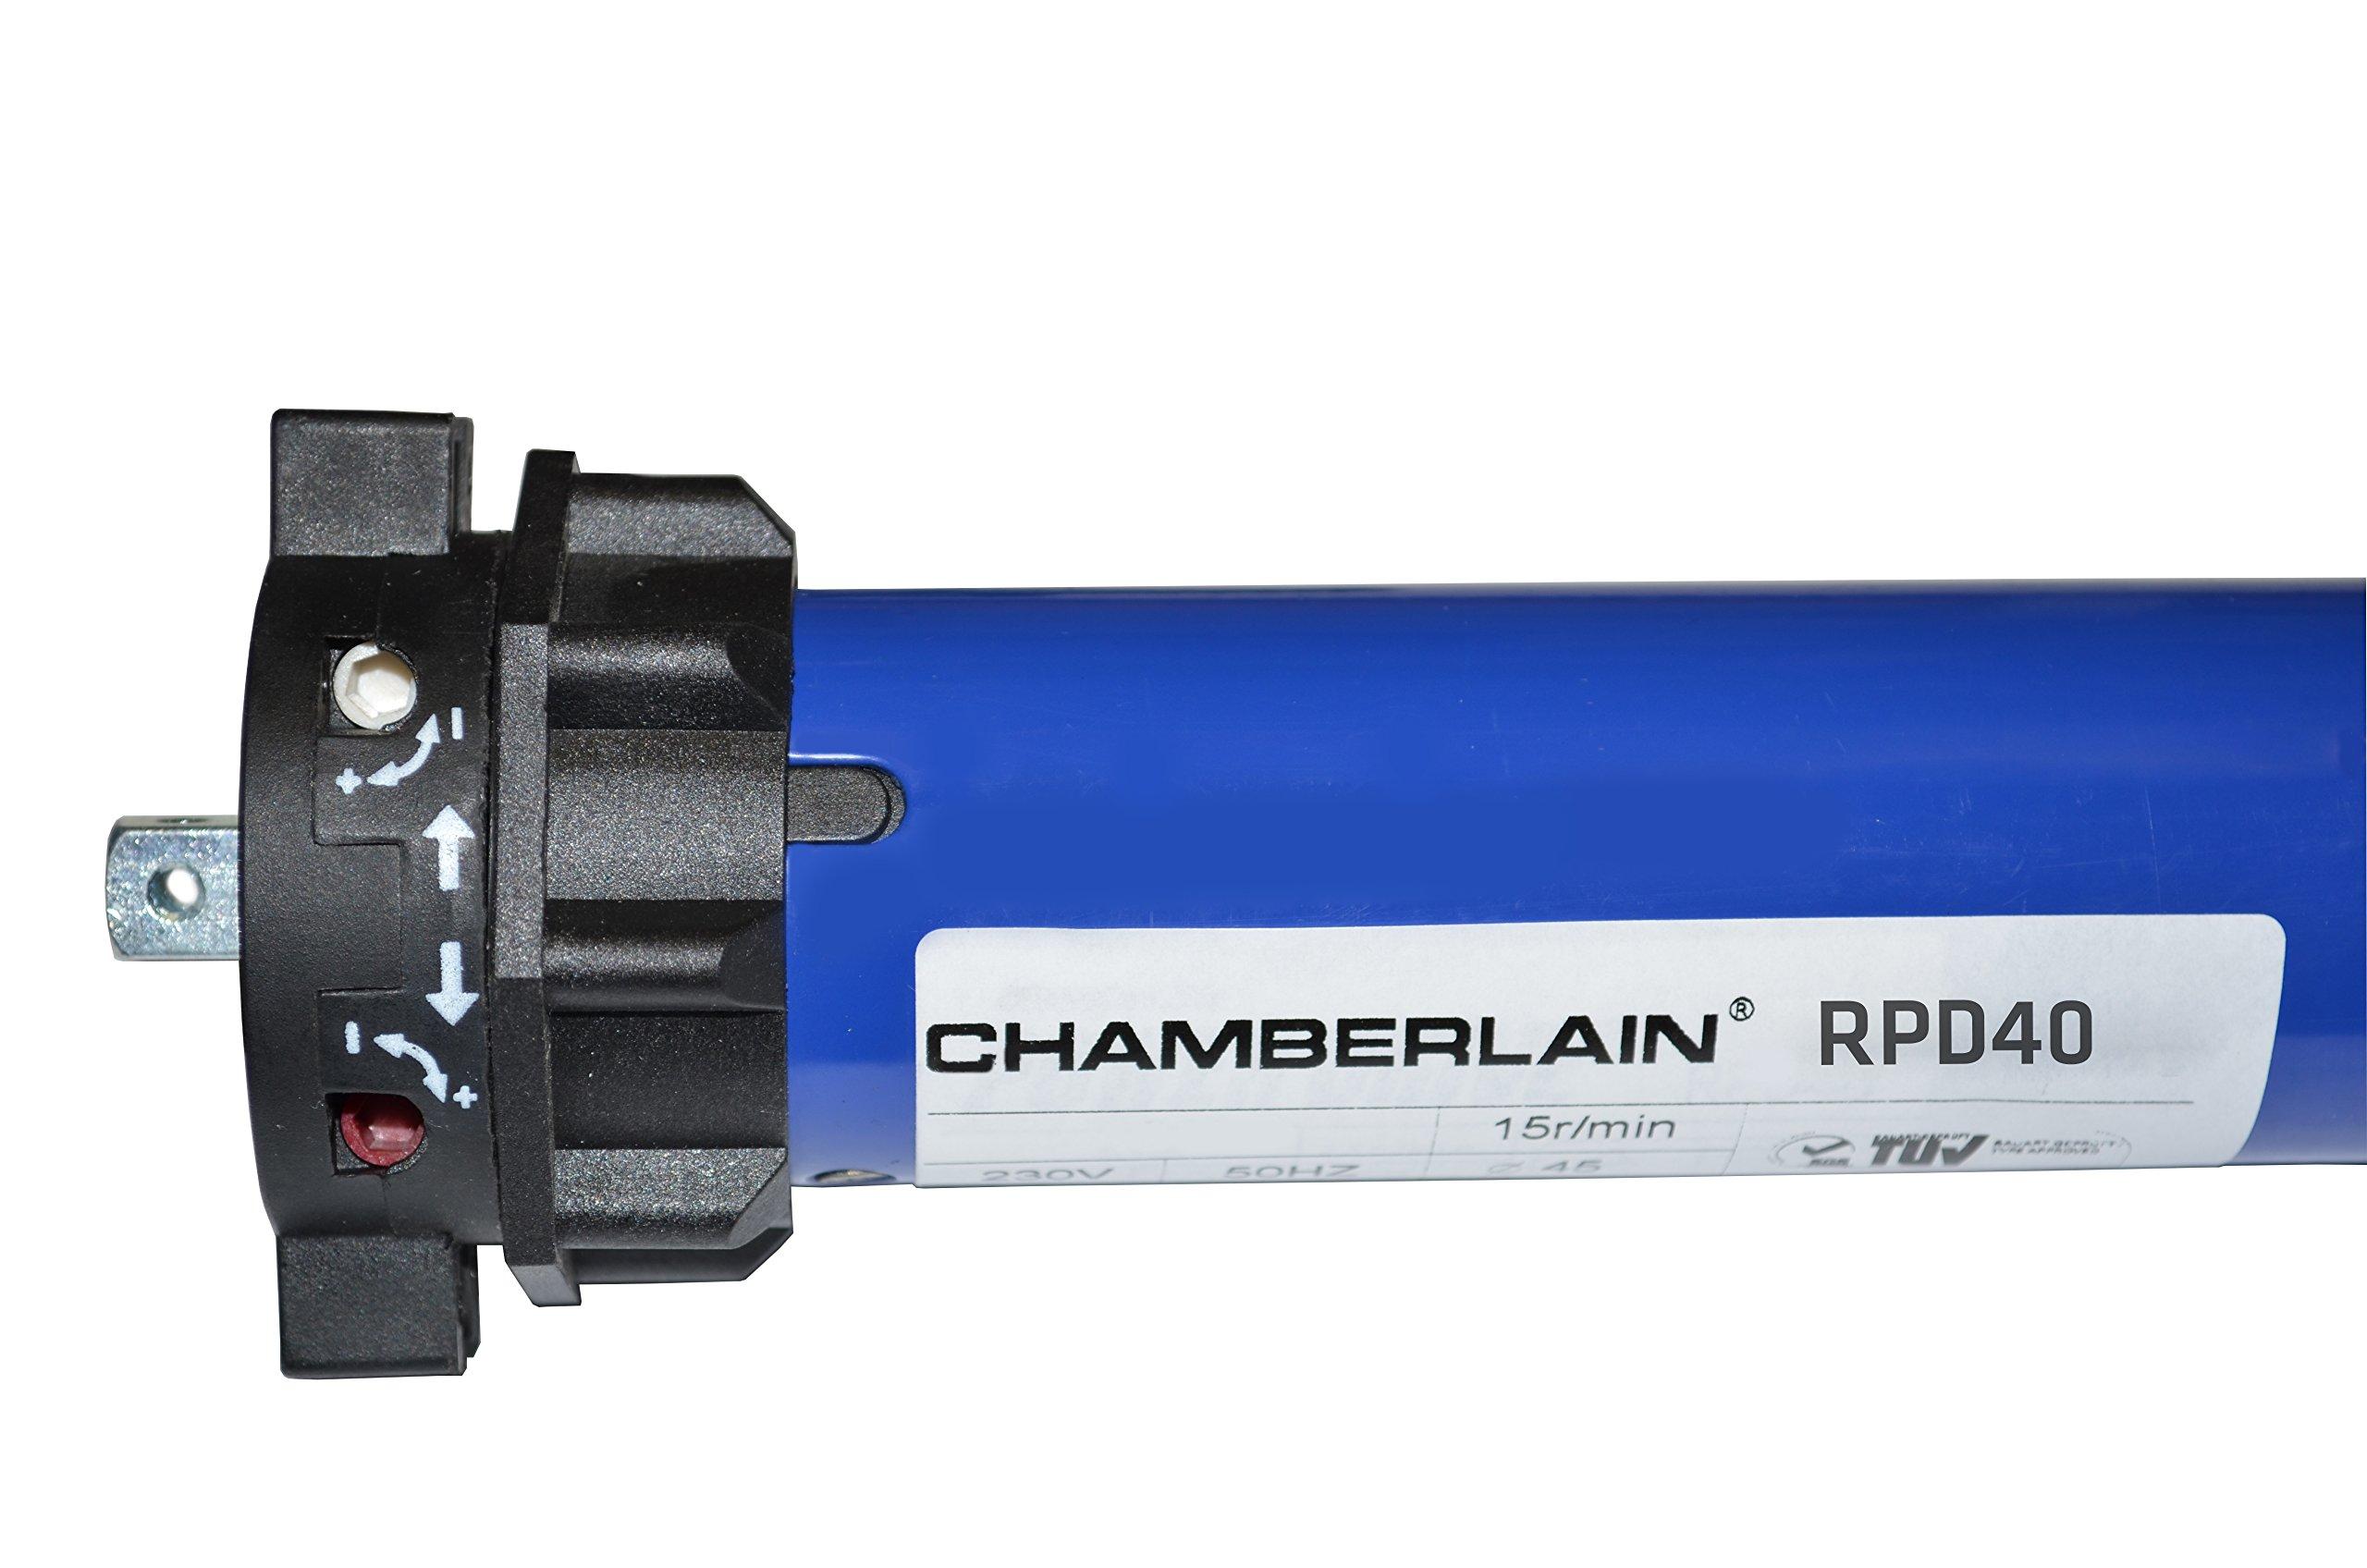 Chamberlain Shutter Motor 40Nm Qty 1RPD40-05 by Chamberlain